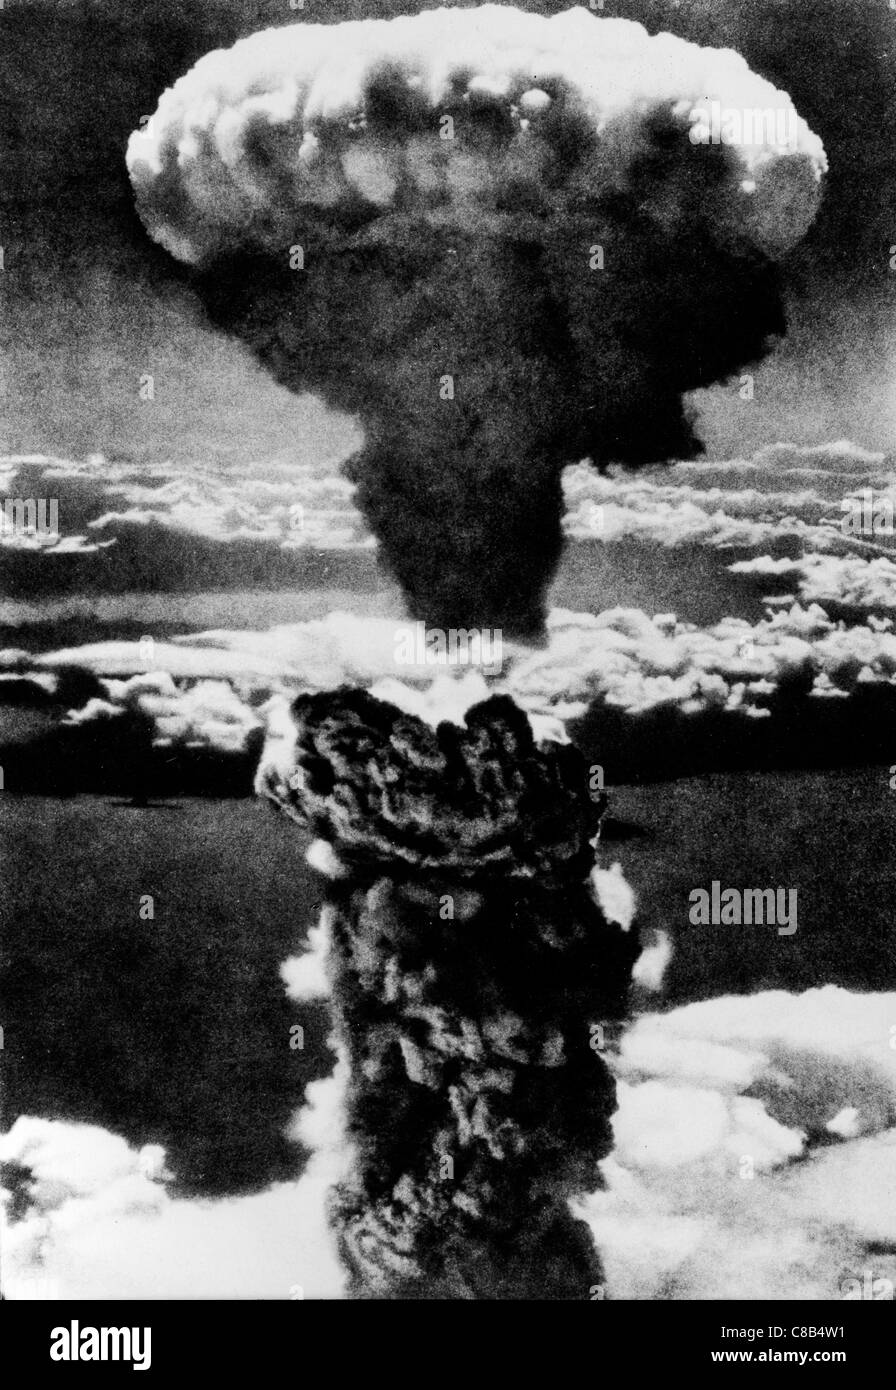 Atomexplosion in Hiroshima, 1945 Stockfoto